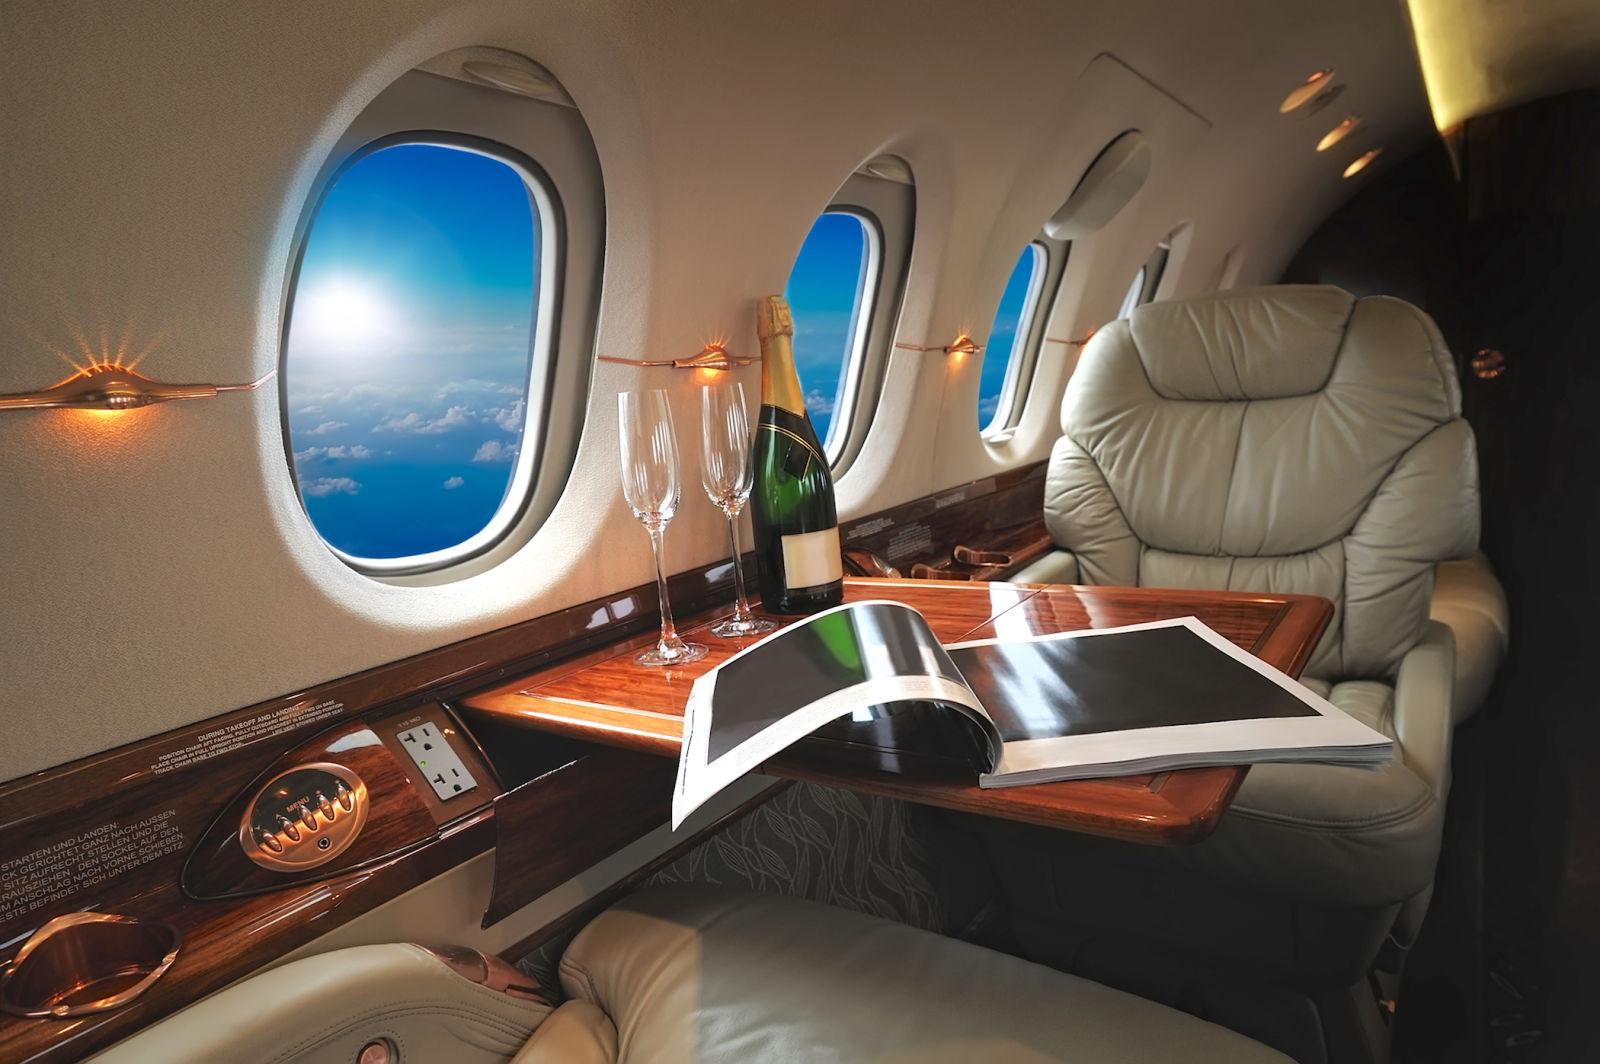 luxury, private jet